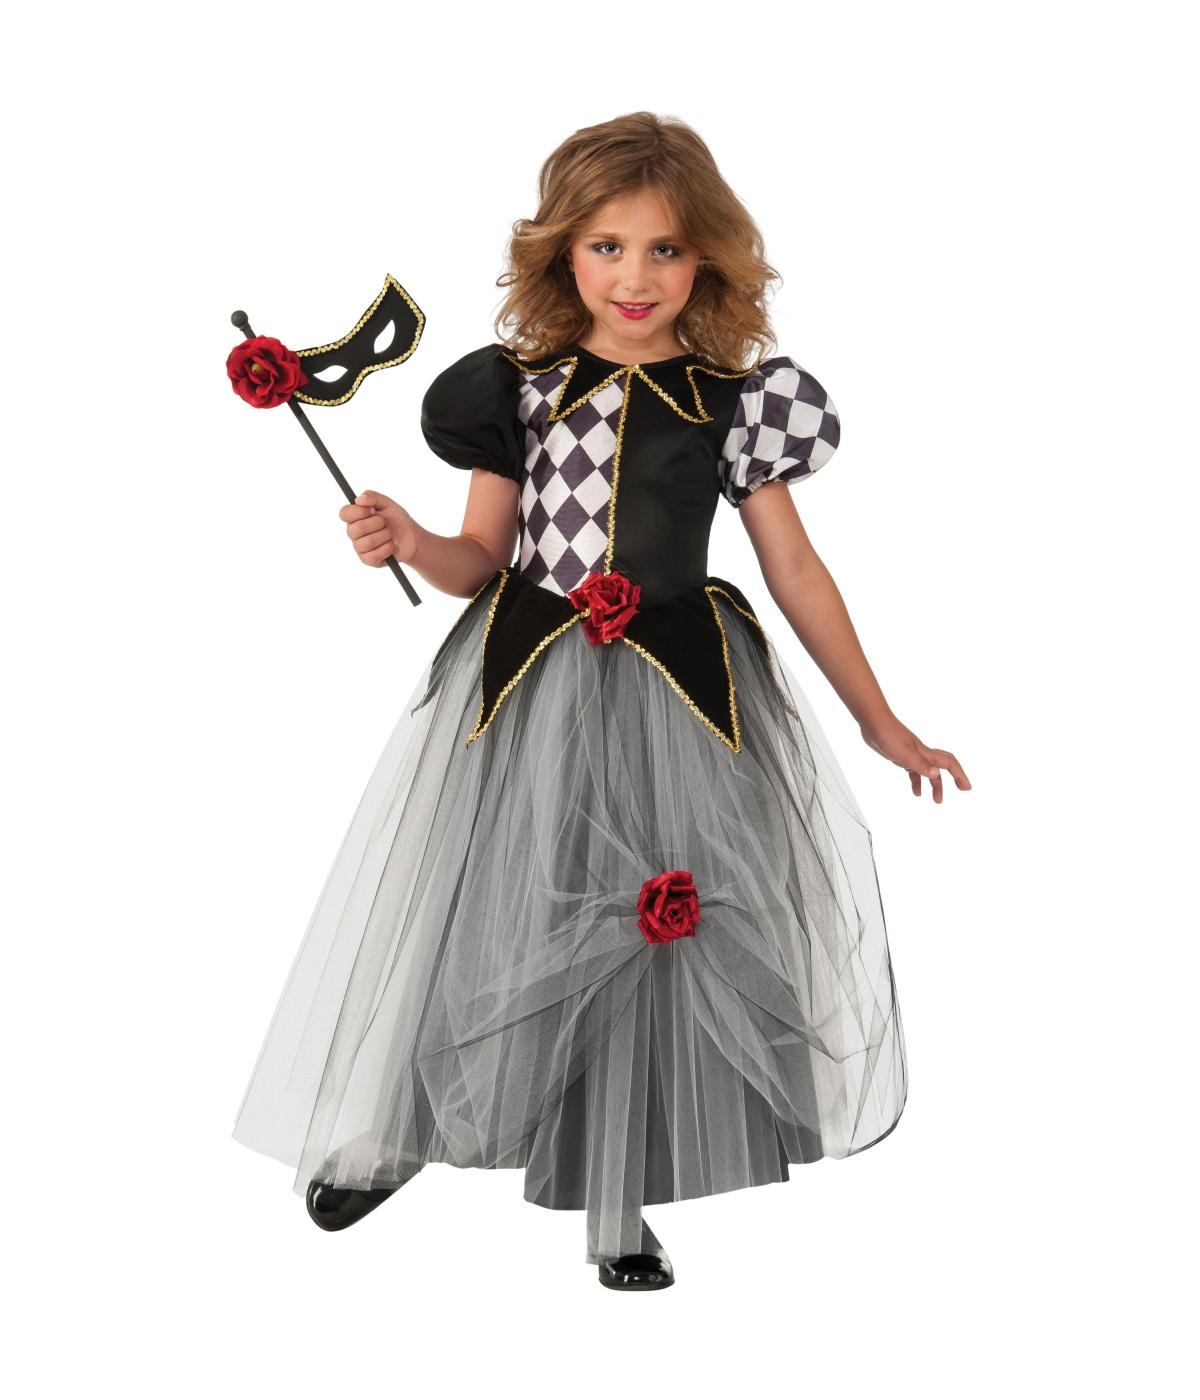 91f8666fcb Venetian Masquerade Princess Girls Costume - Renaissance Costumes